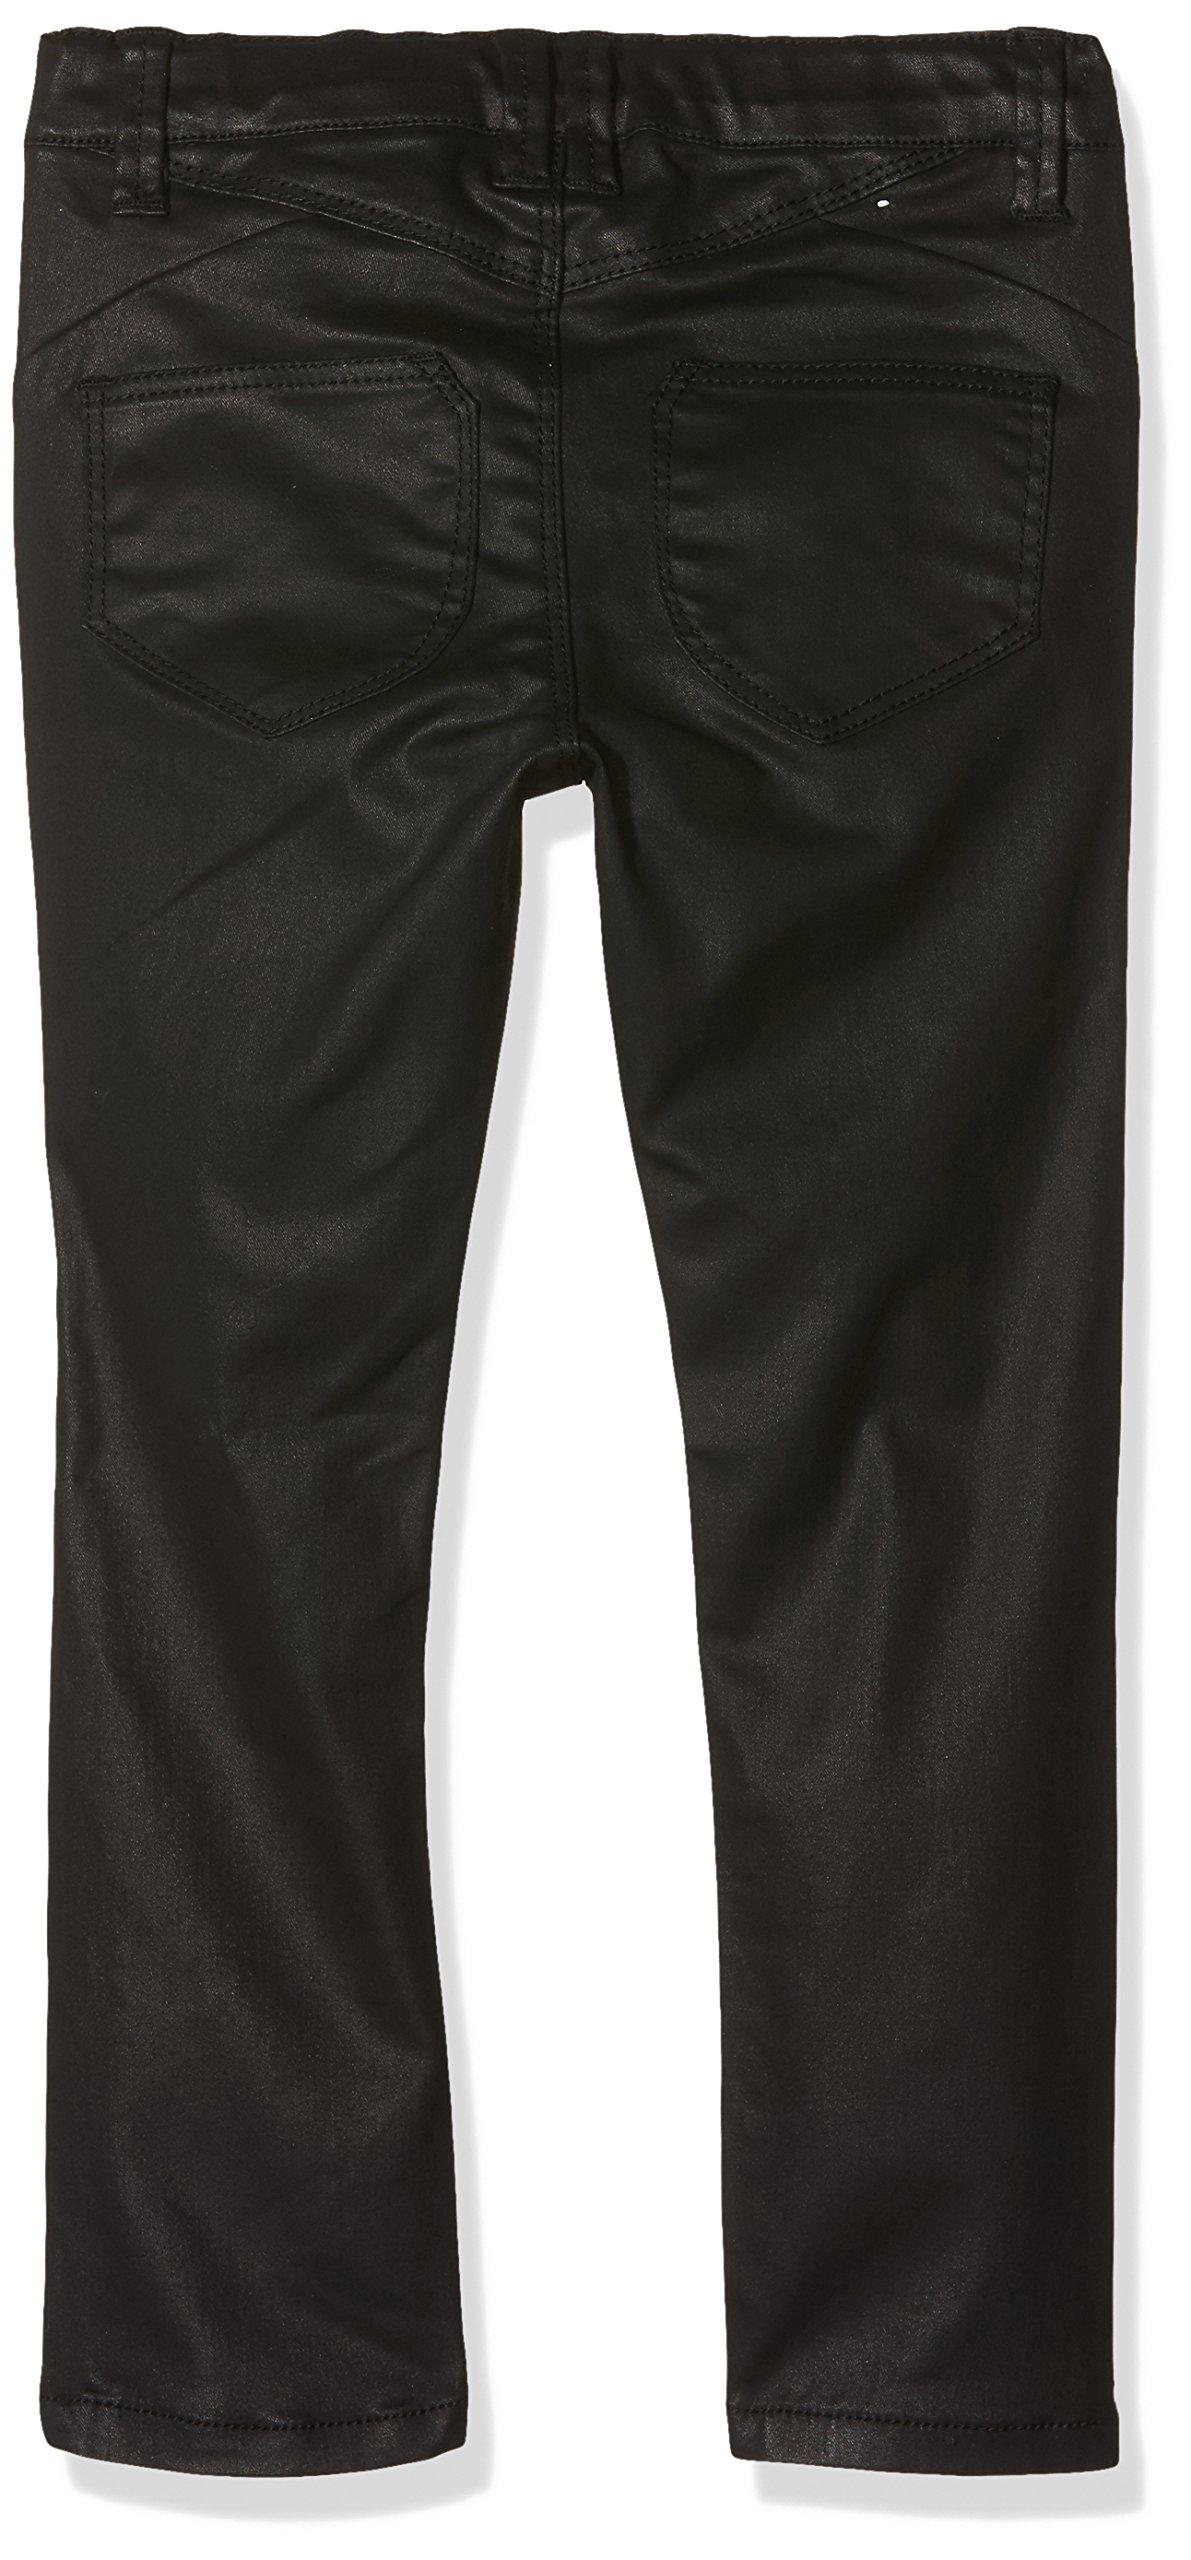 NAME IT Nitblosa Skinny TWI Pant F Mini Pantalones para Bebés 2